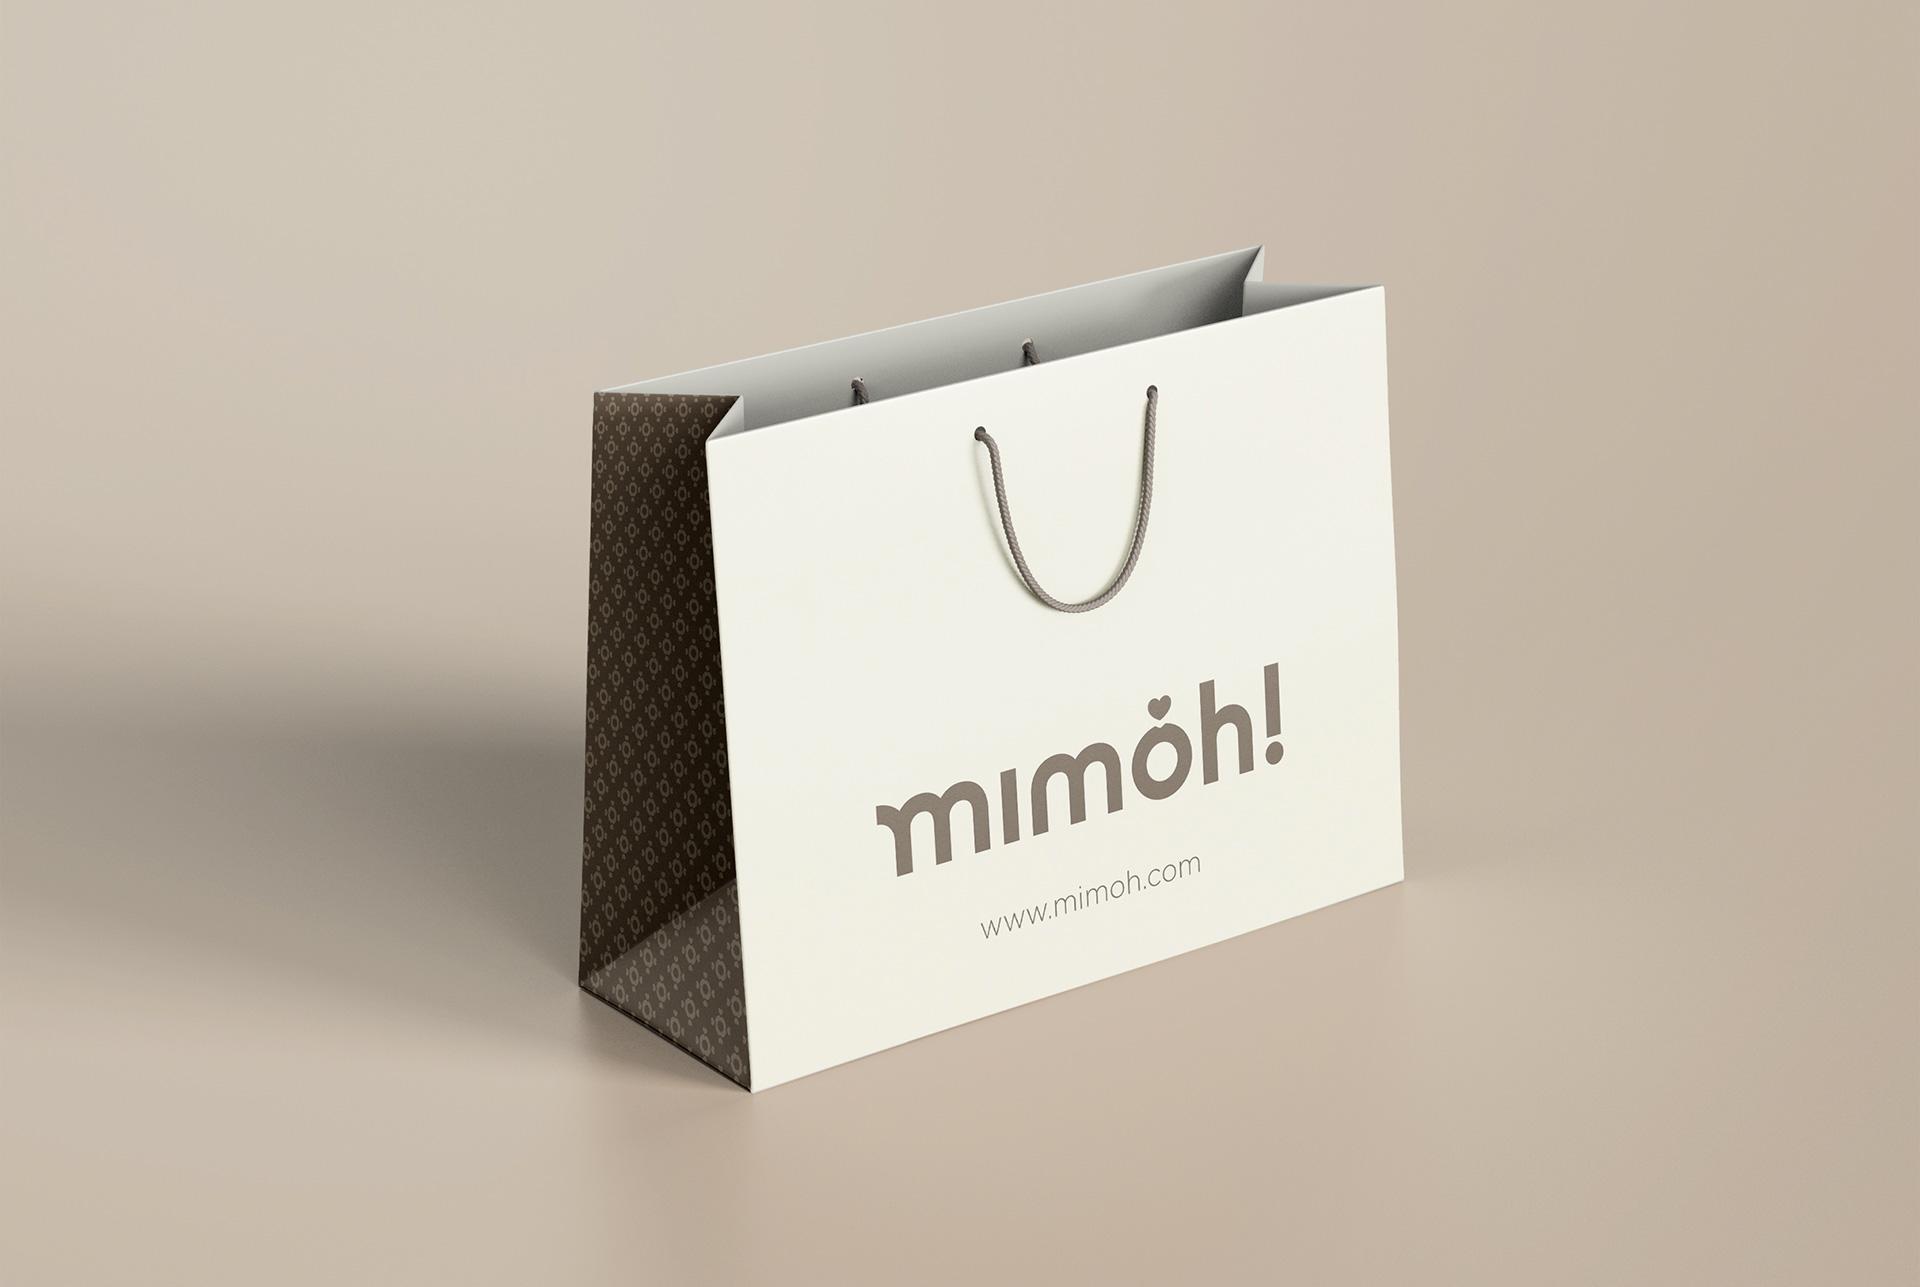 Mimoh 2